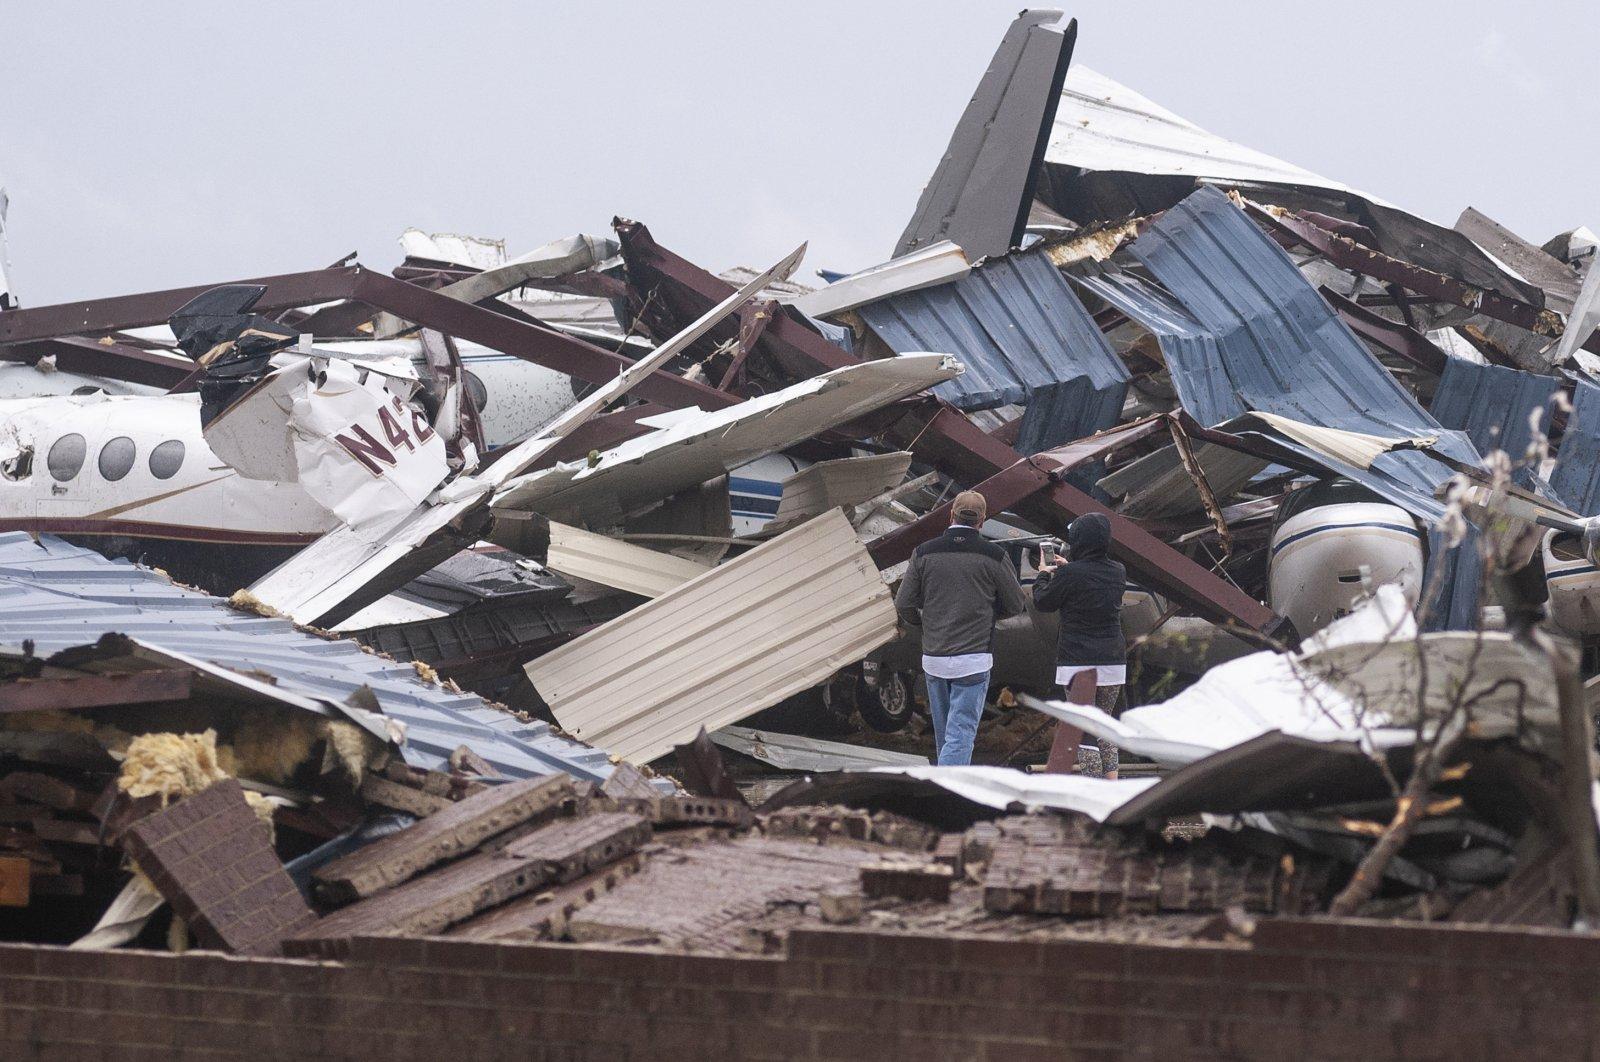 People survey damage to buildings and airplanes after a tornado at Jonesboro Municipal Airport in Jonesboro, Arkansas, the U.S., Saturday, March 28, 2020. (AP Photo)